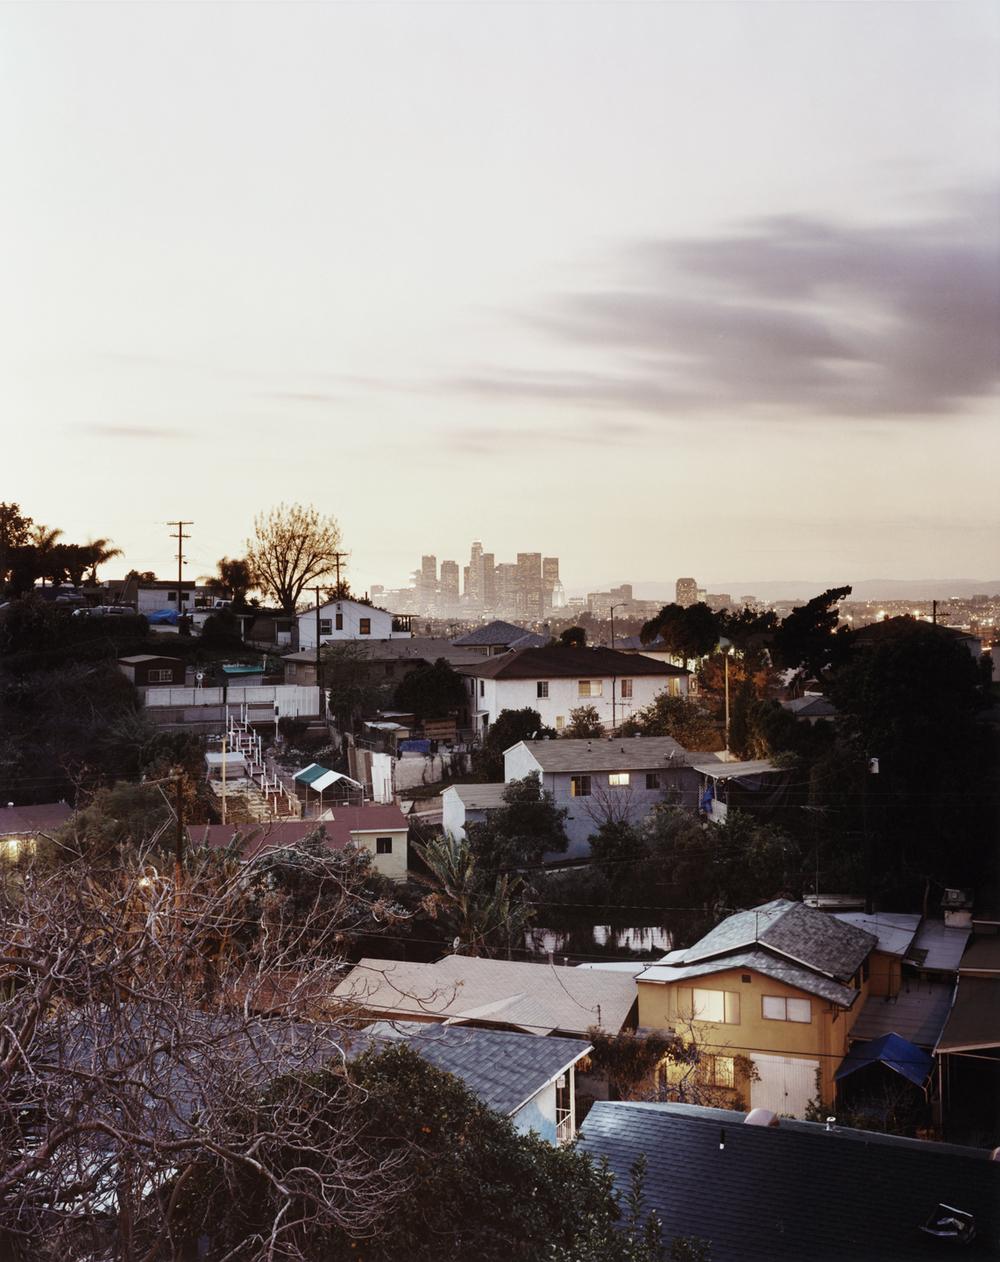 baldwin hills view.jpg